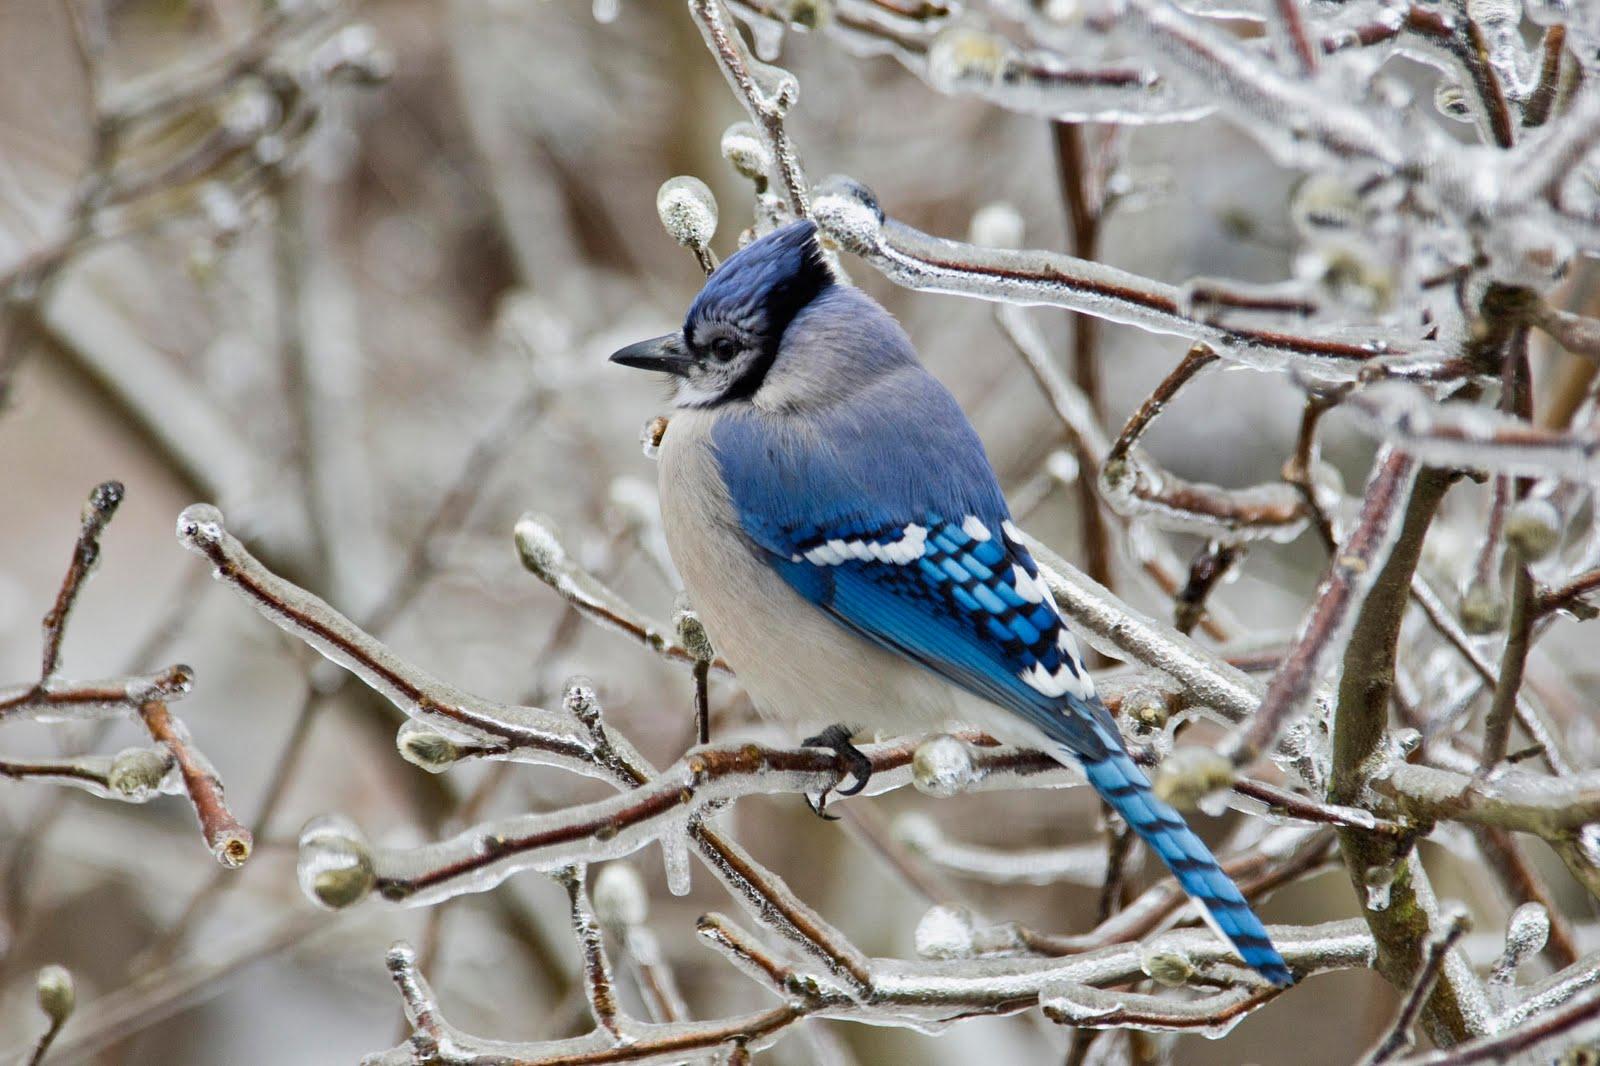 Blue Bird in Ice Nature Wallpaper   Nature Wallpaper 1600x1066